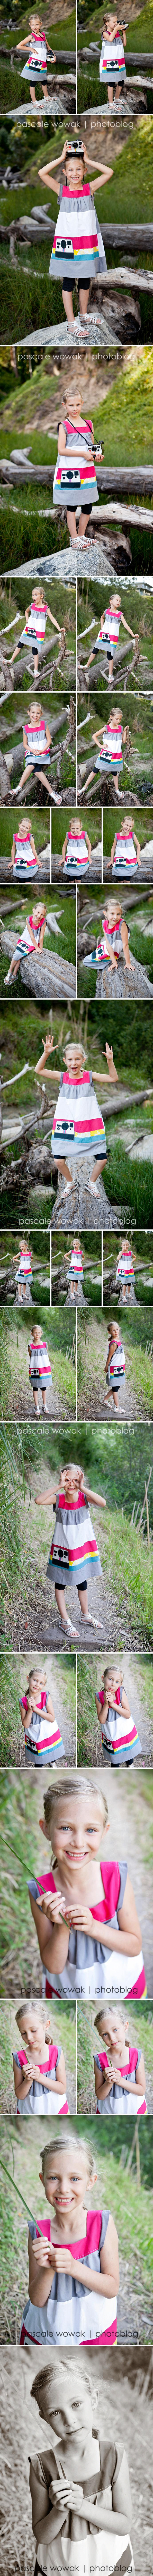 Polaroiddress